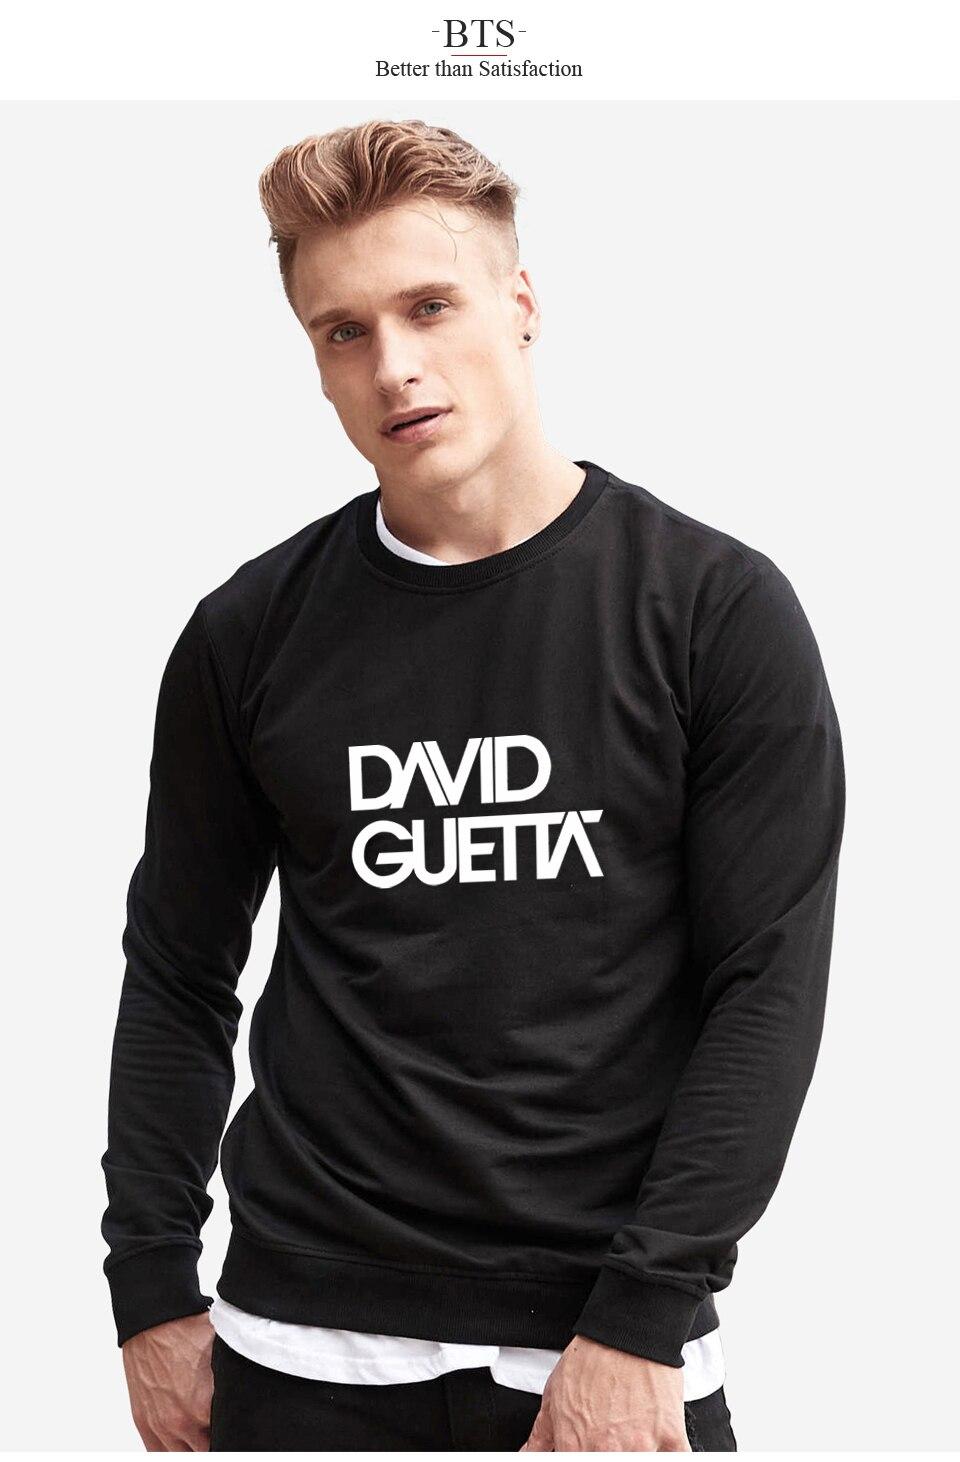 BTS Funny David Guetta Tracksuit Loose Hoodie Sweatshirt Boys Harajuku Comfortable Oversized Hoodie Long Winter Streetwear Tops